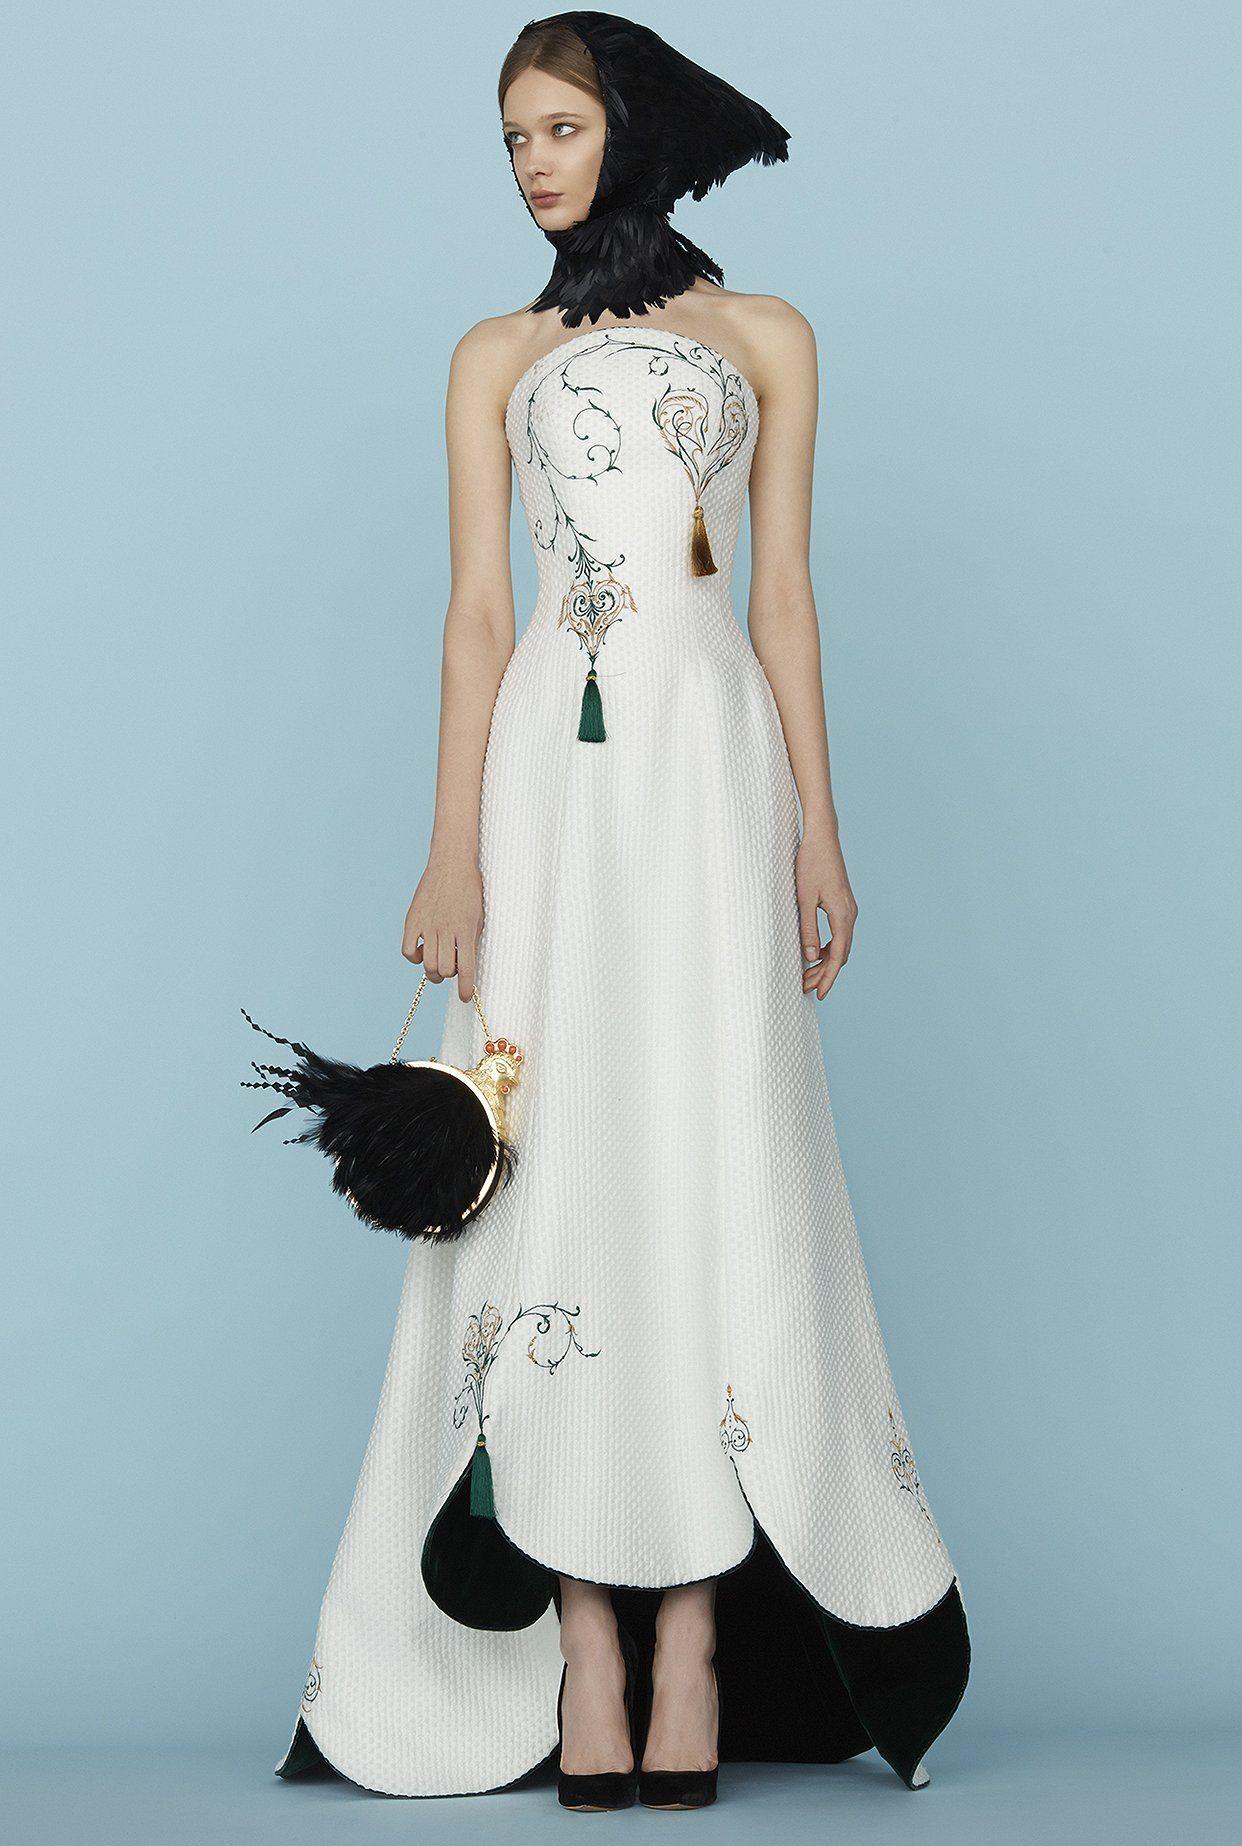 fashiondailymag:Ulyana Sergeenko couture ss15 highlights Paris.(fdmLOVES edit)